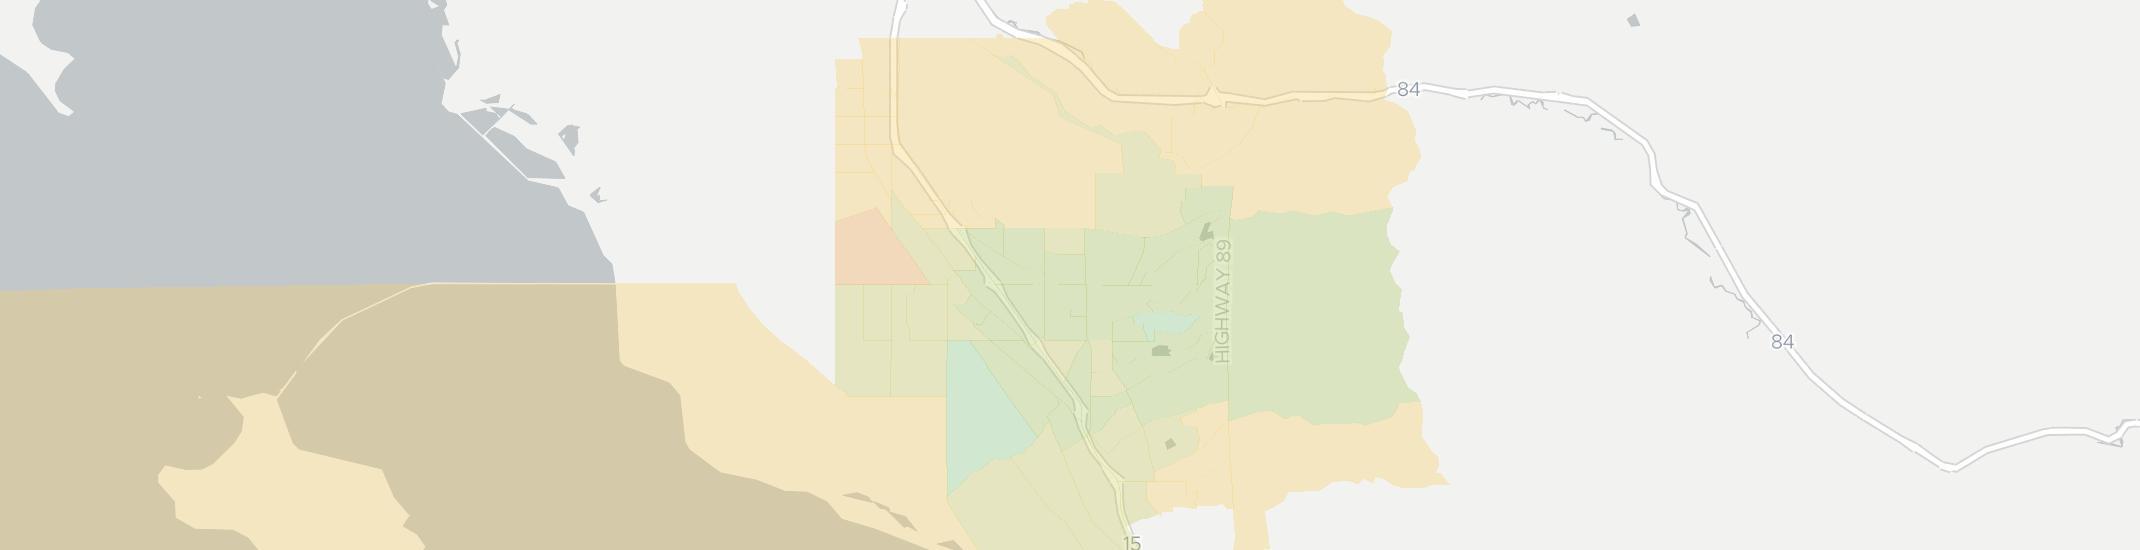 Clearfield Utah Zip Code Map.Internet Providers In Layton Ut Compare 20 Providers